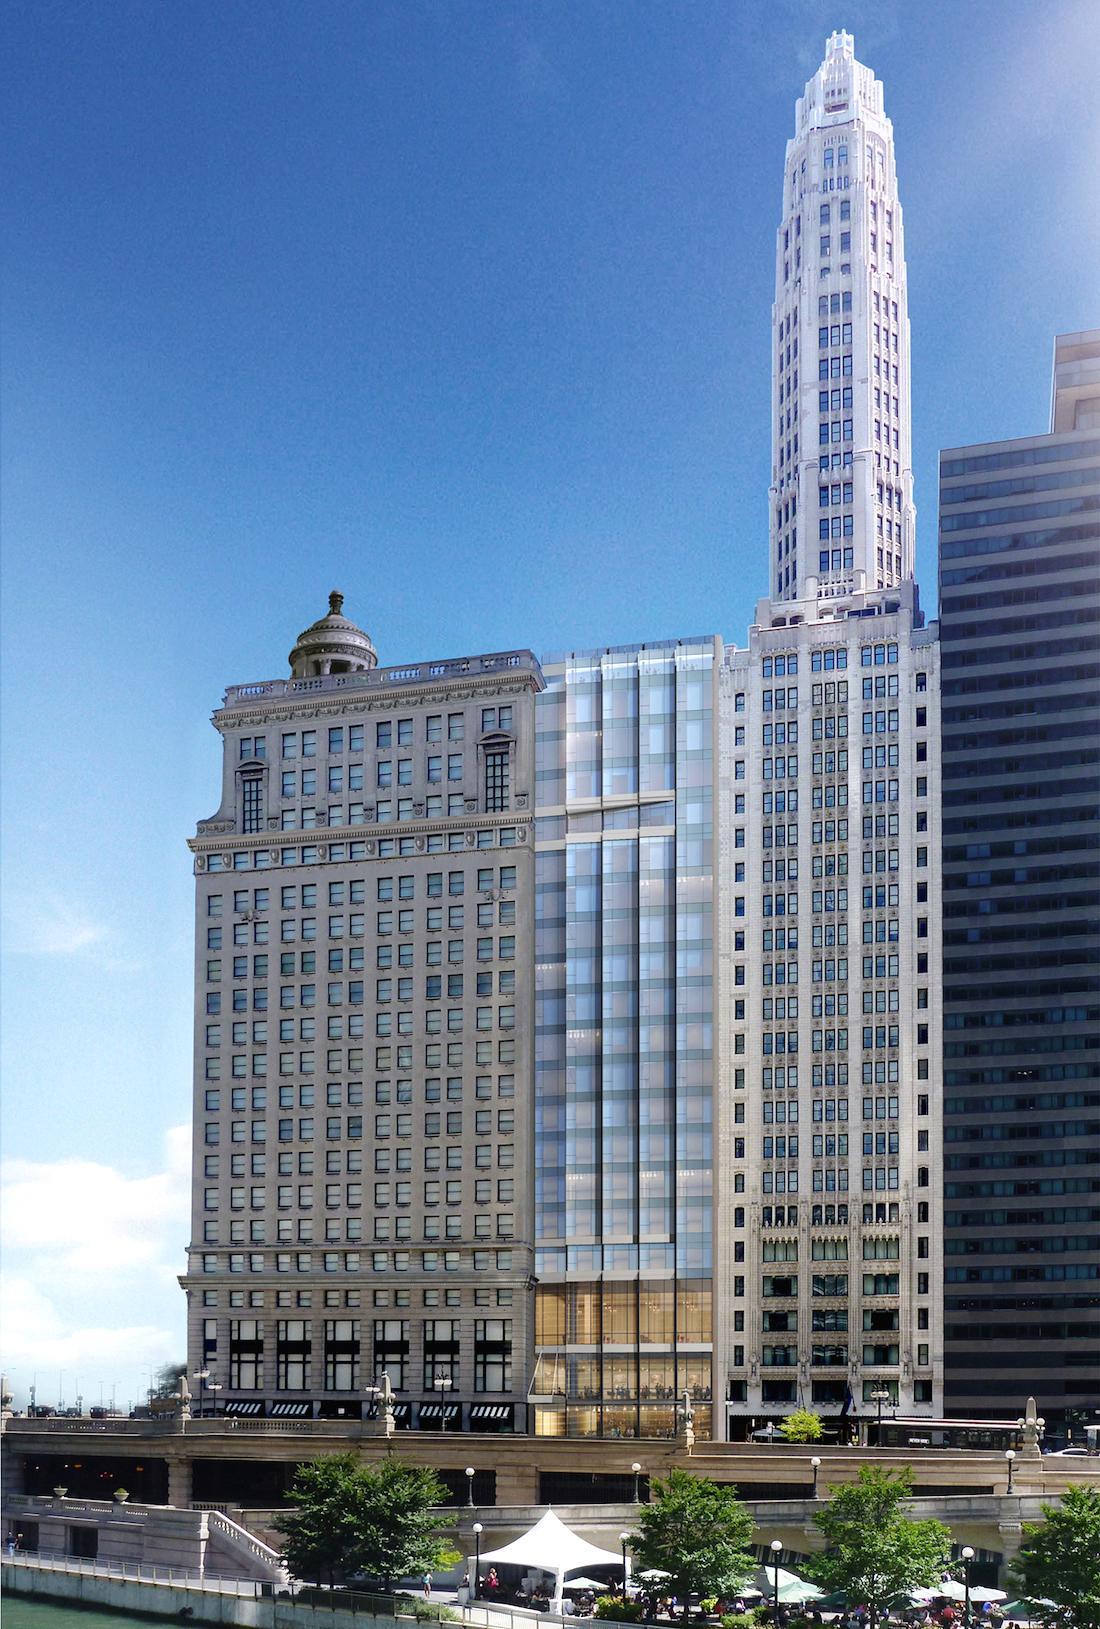 LondonHouse Hotel, Chicago, USA, Oxford Capital Group, Goettsch Partners